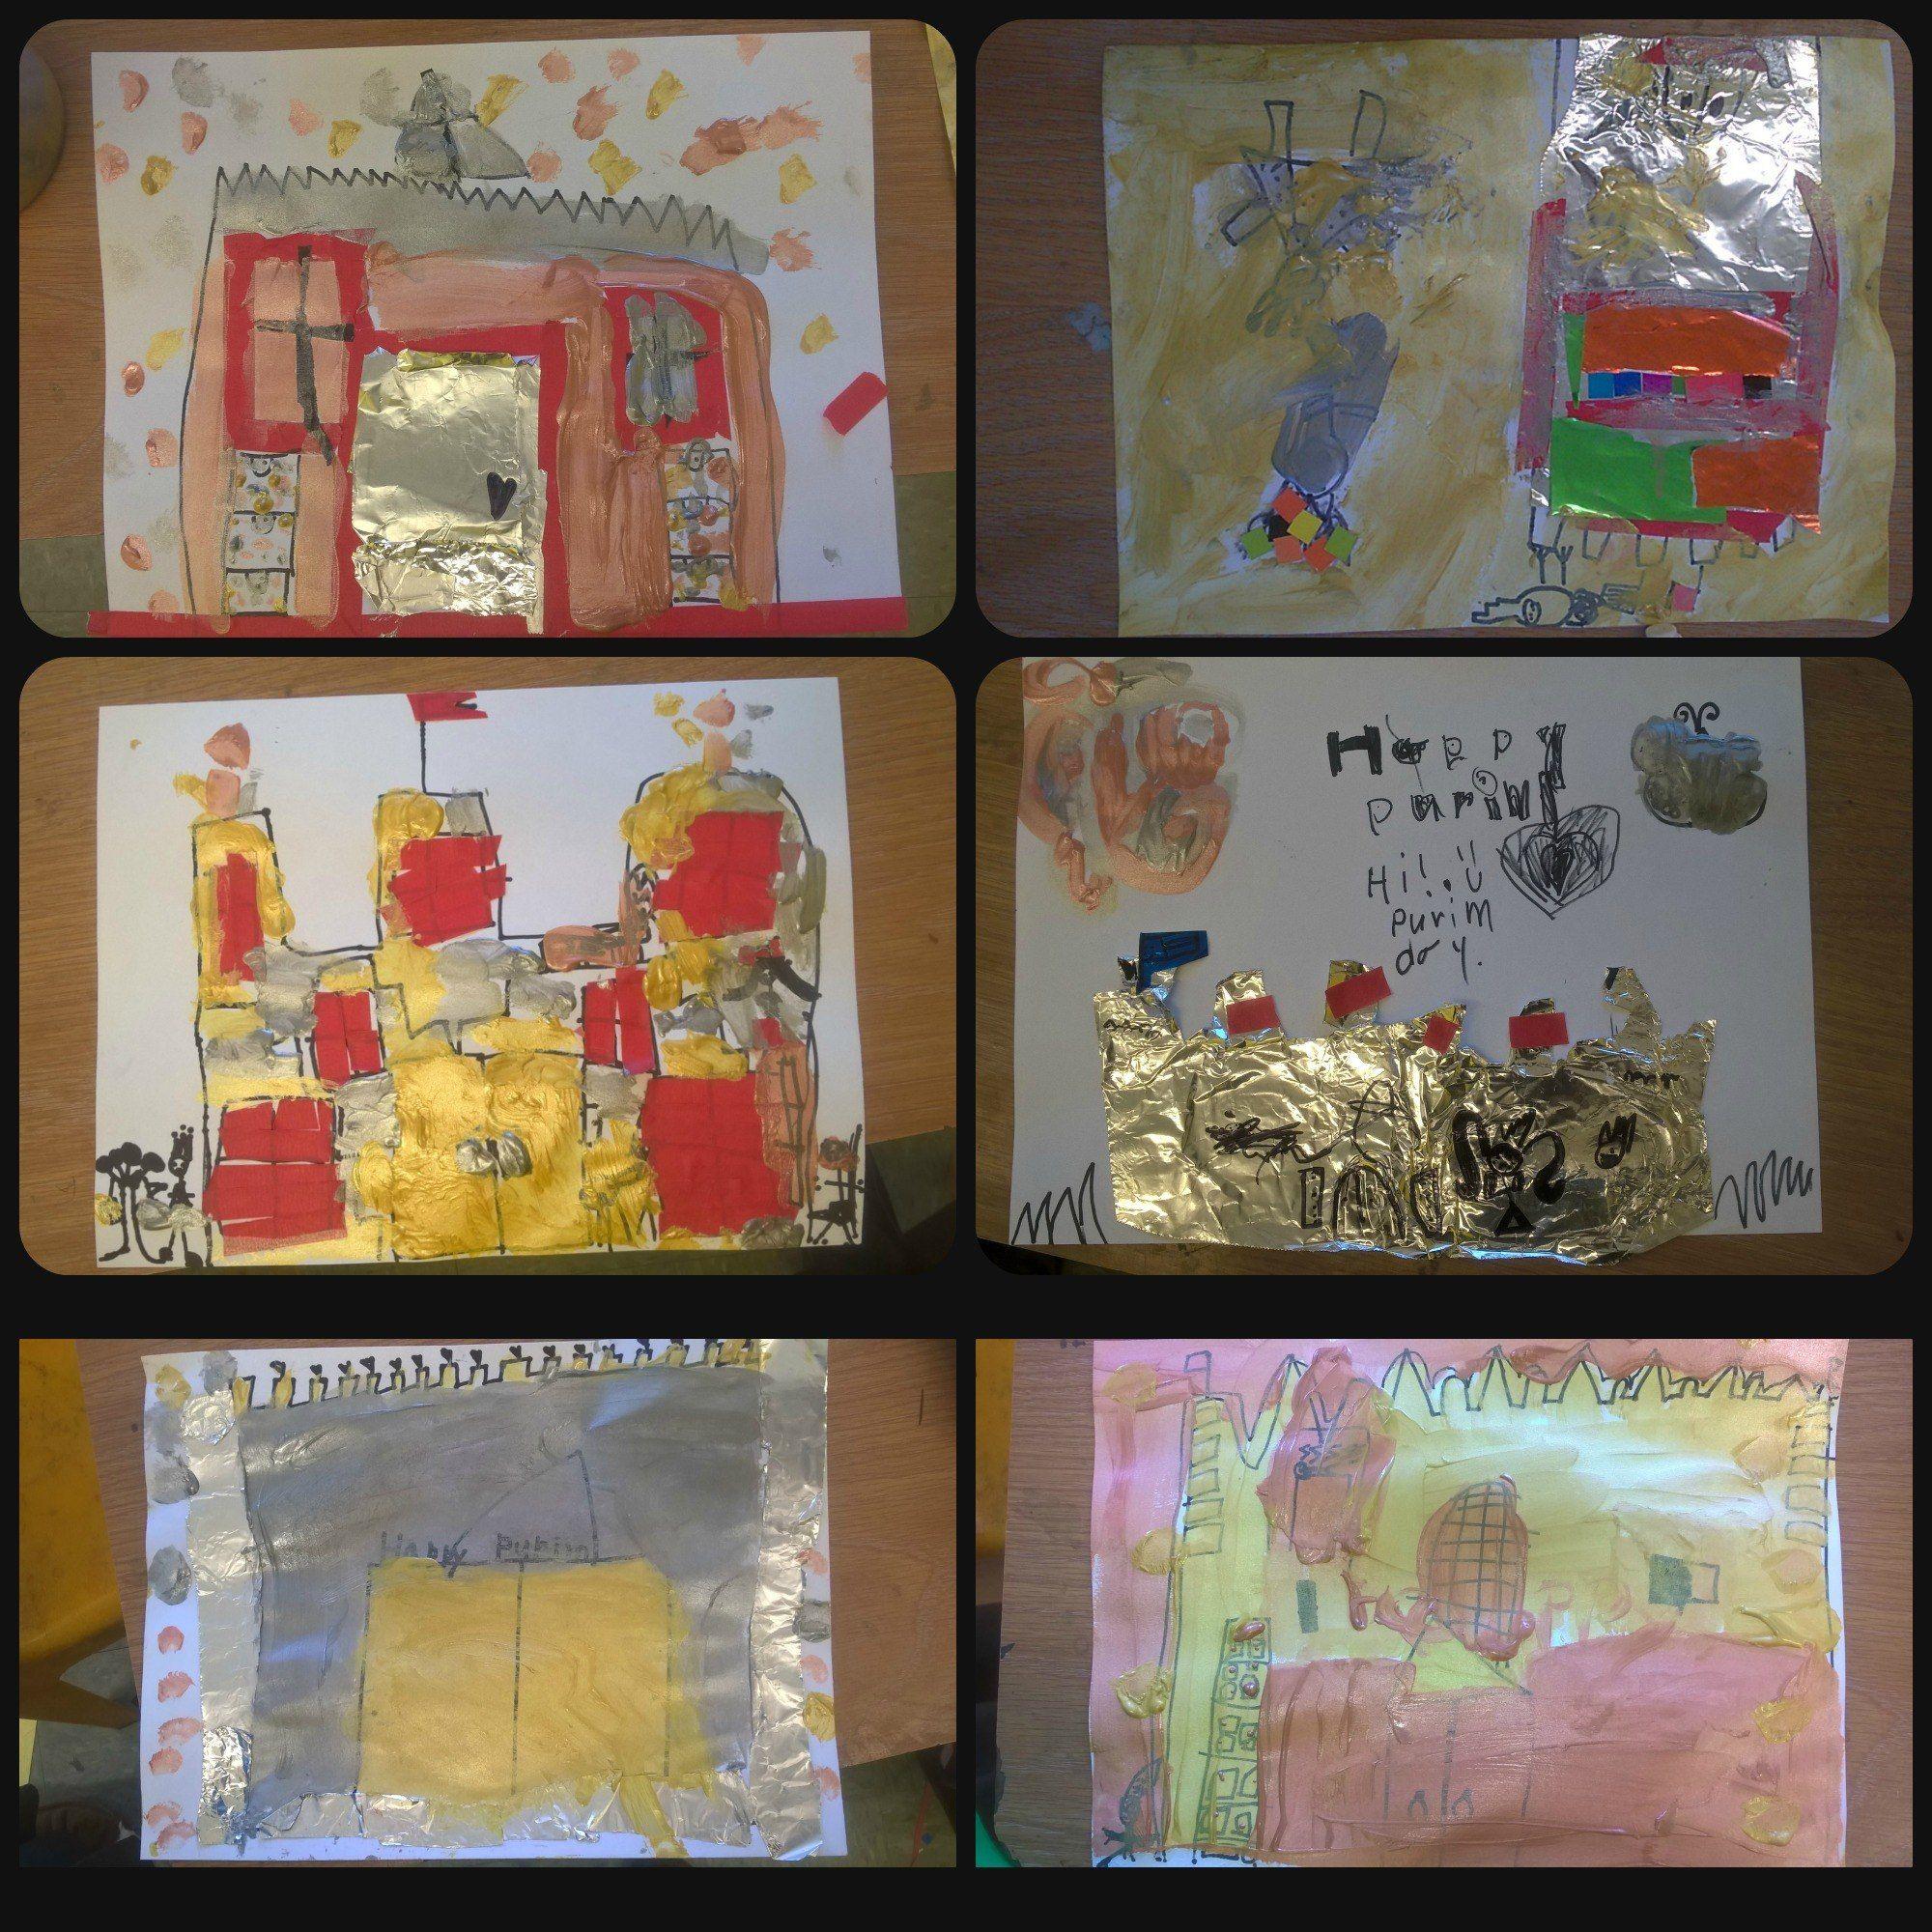 Castles For Purim In 2020 Purim Purim Crafts Jewish Preschool